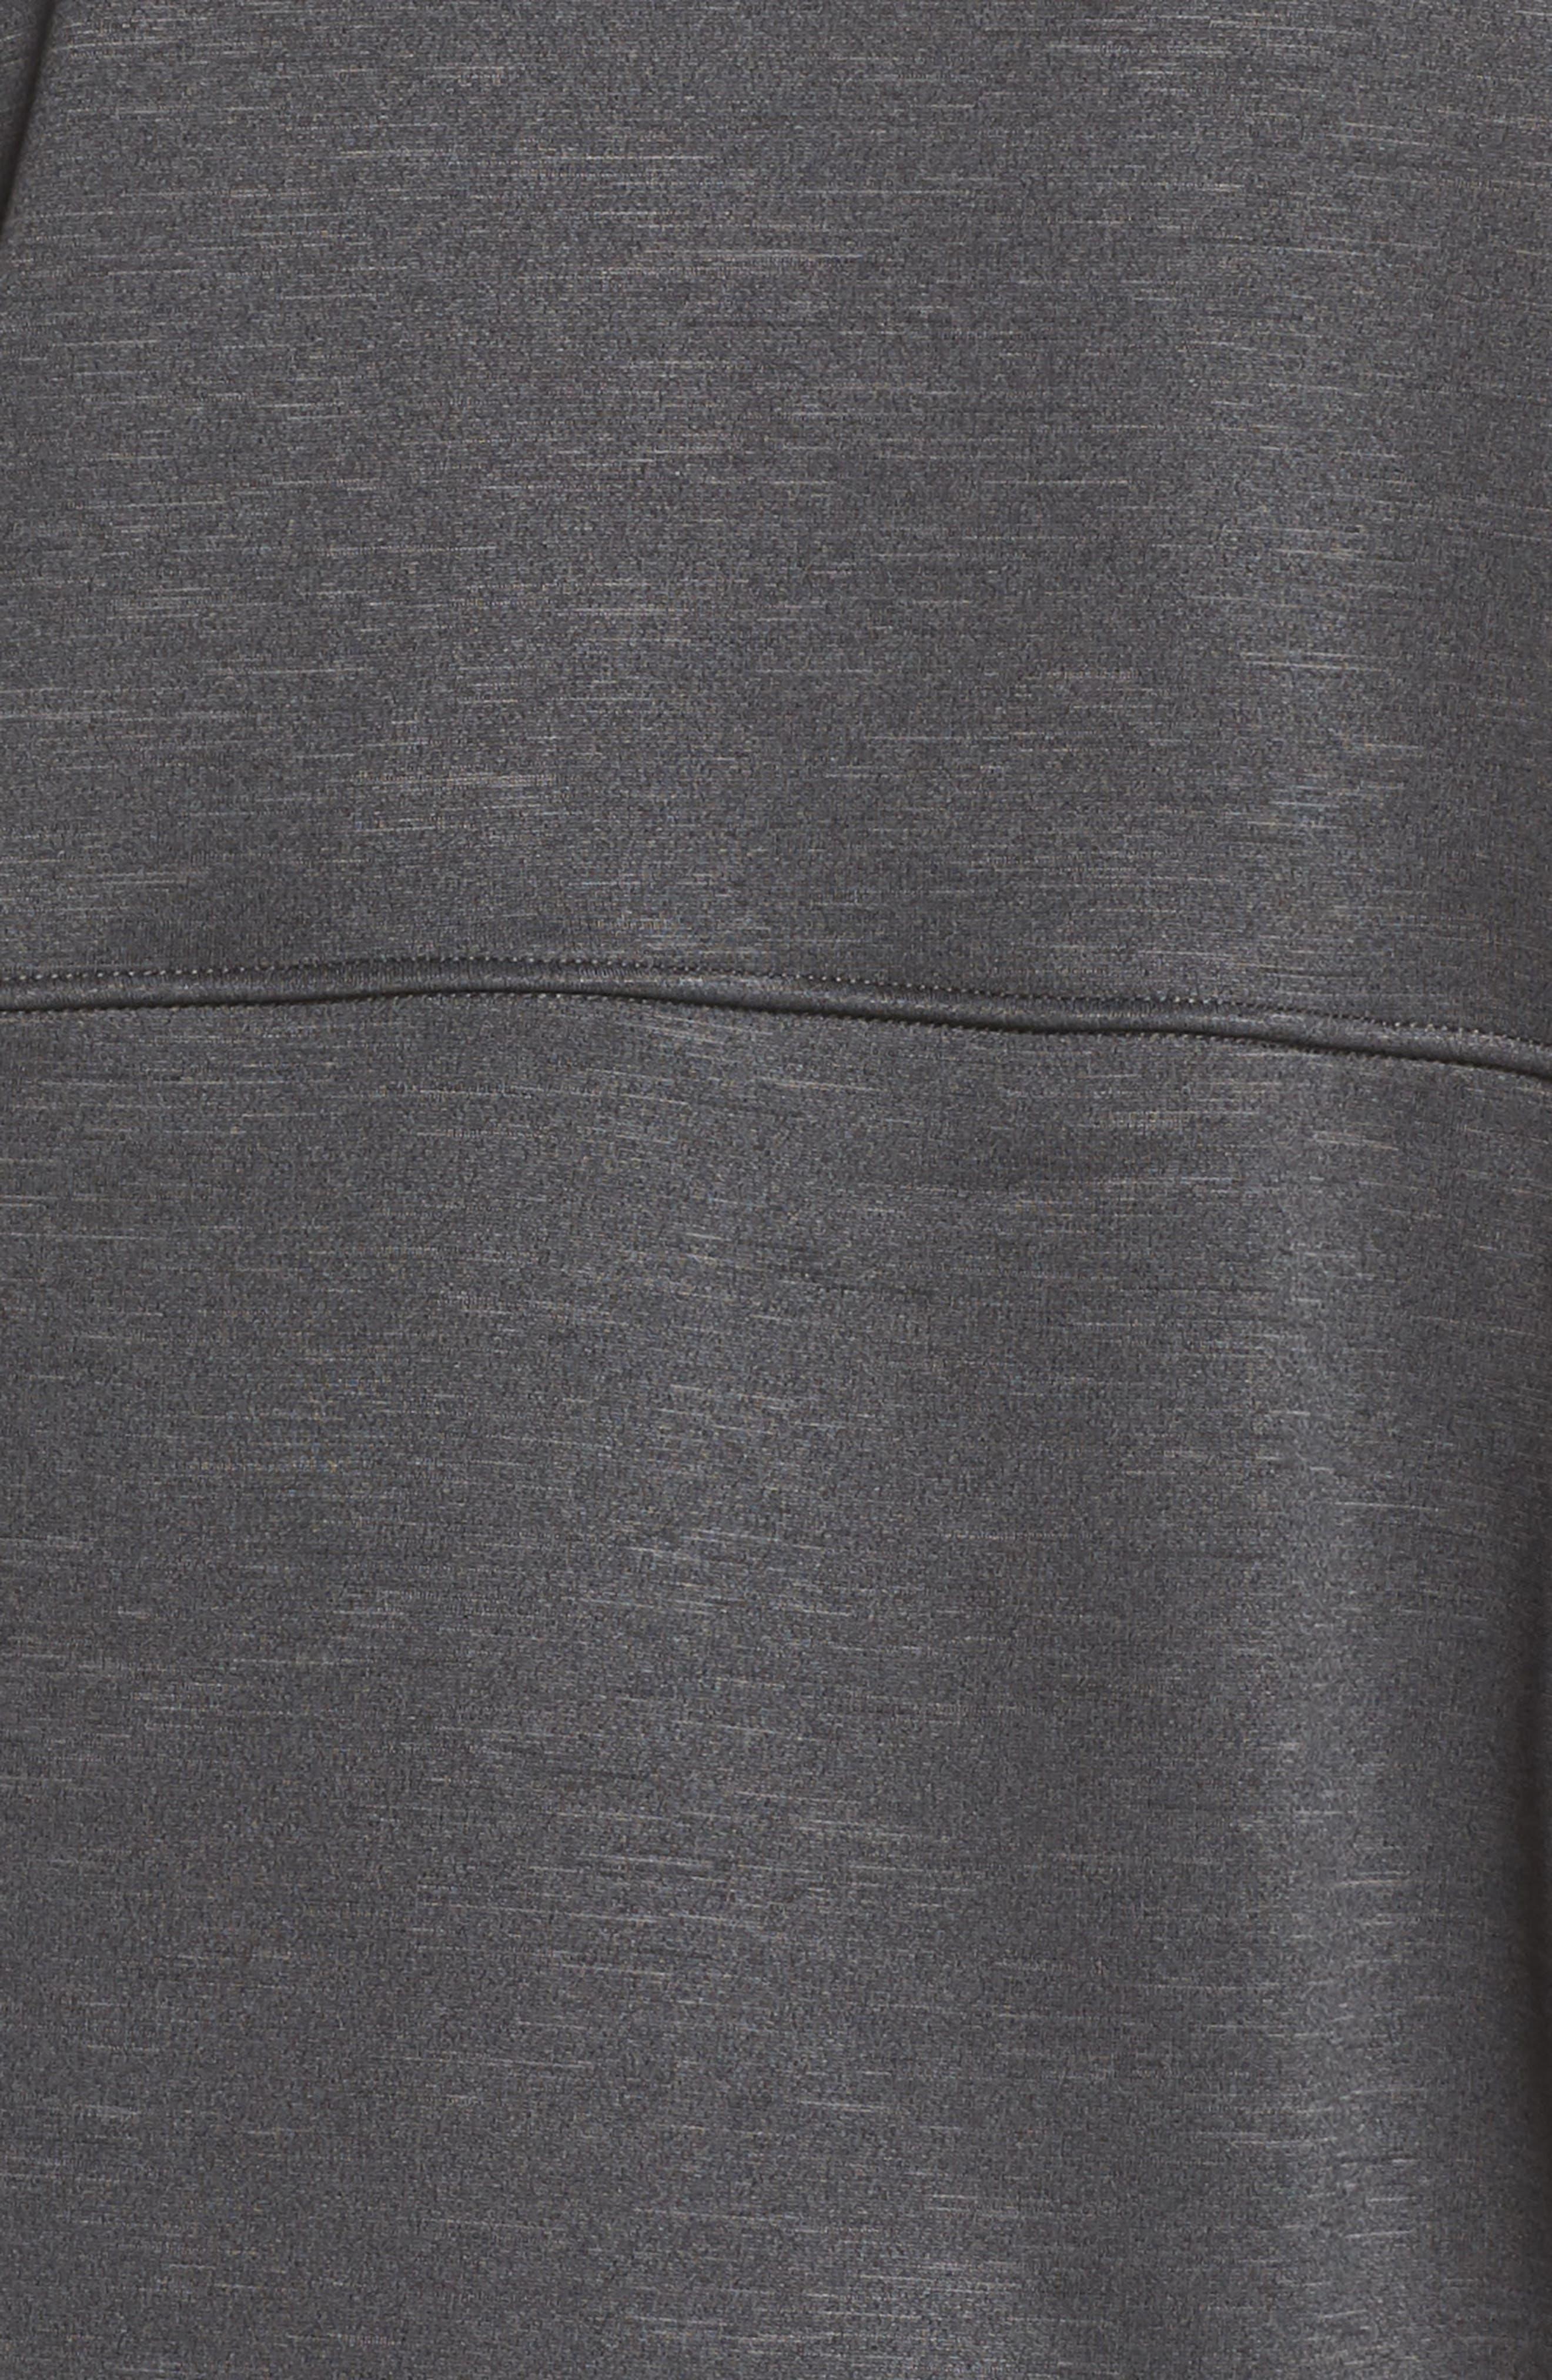 Cozy Slacker Jacket,                             Alternate thumbnail 7, color,                             TNF DARK GREY HEATHER